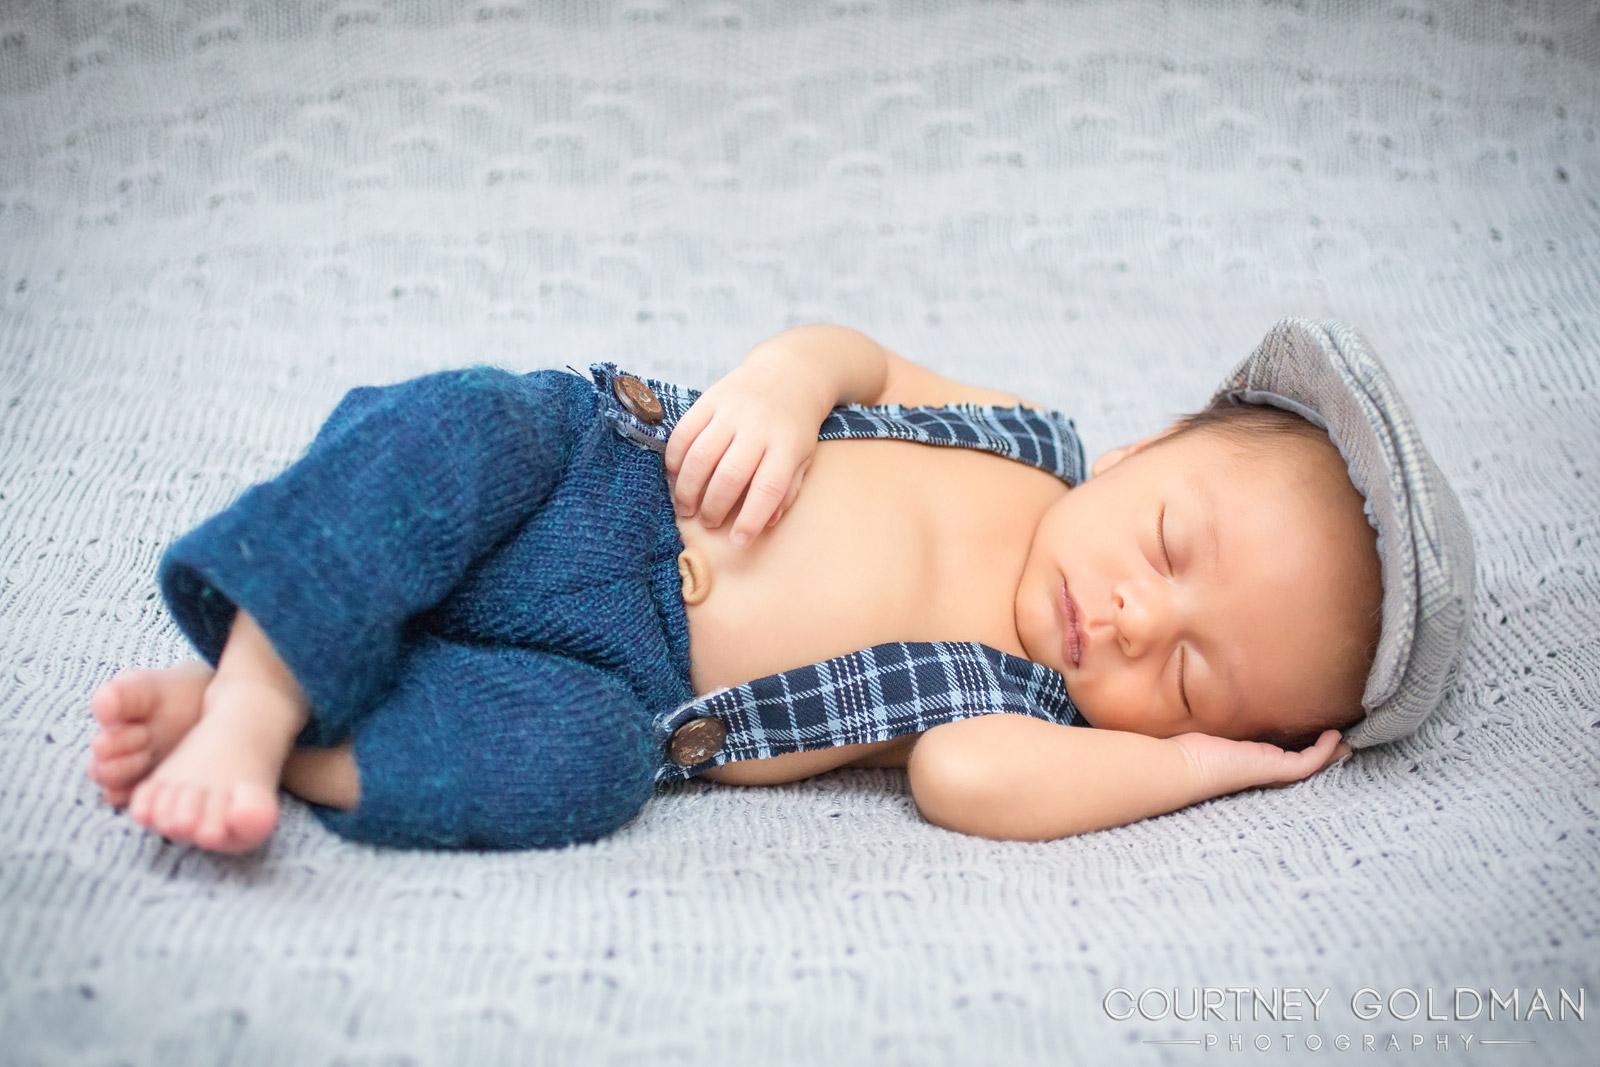 Atlanta Maternity and Newborn Photography by Courtney Goldman 30.jpg